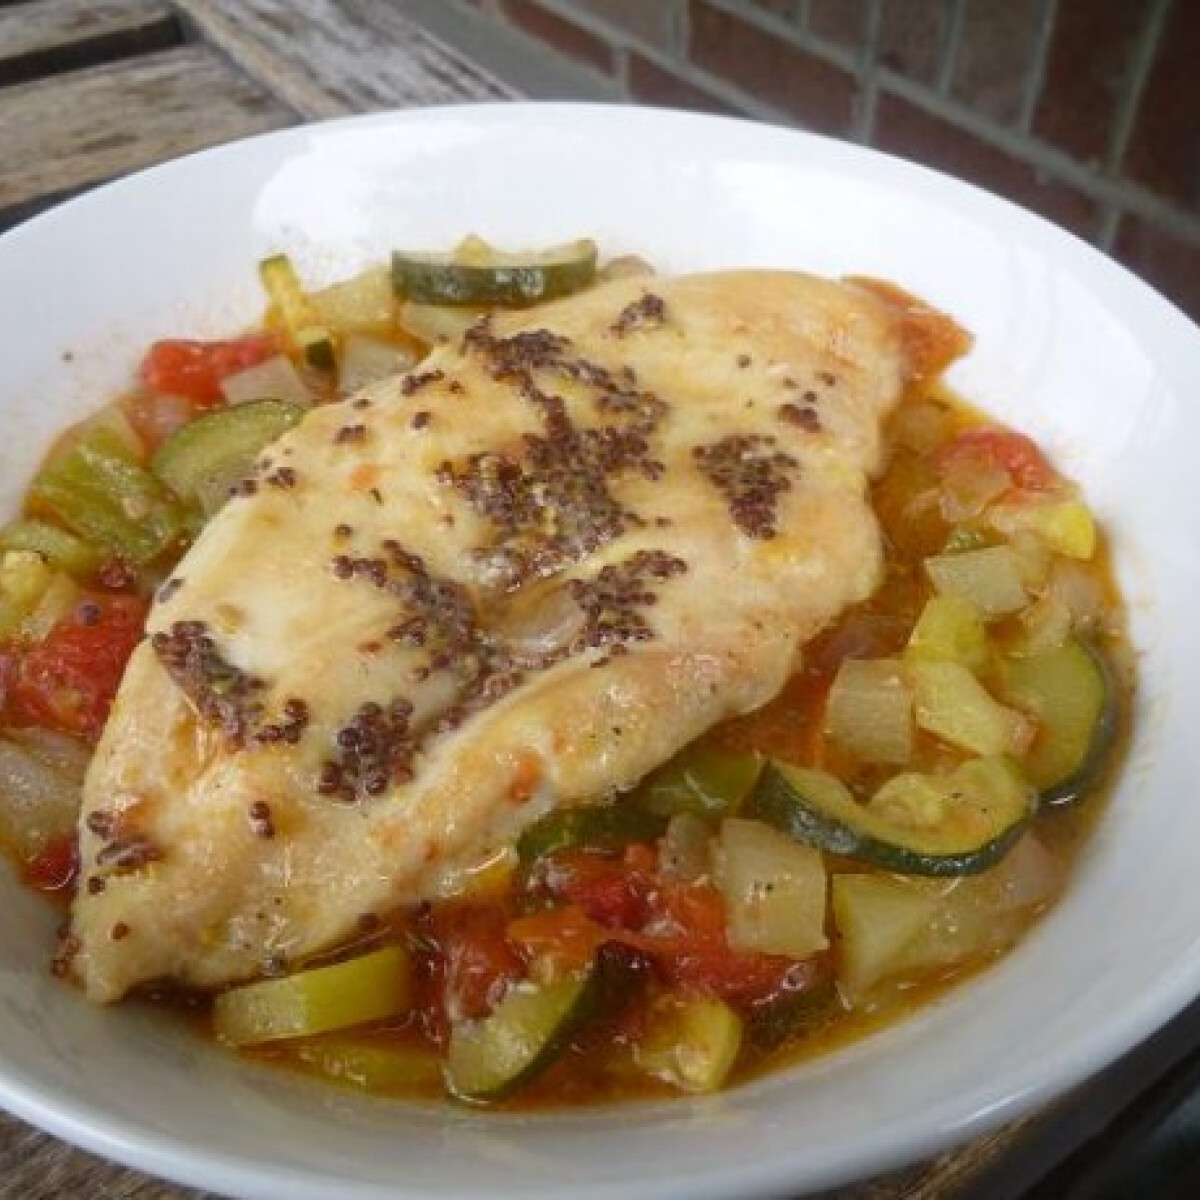 Magvasmustáros-csirkemell vegyes körettel sütve